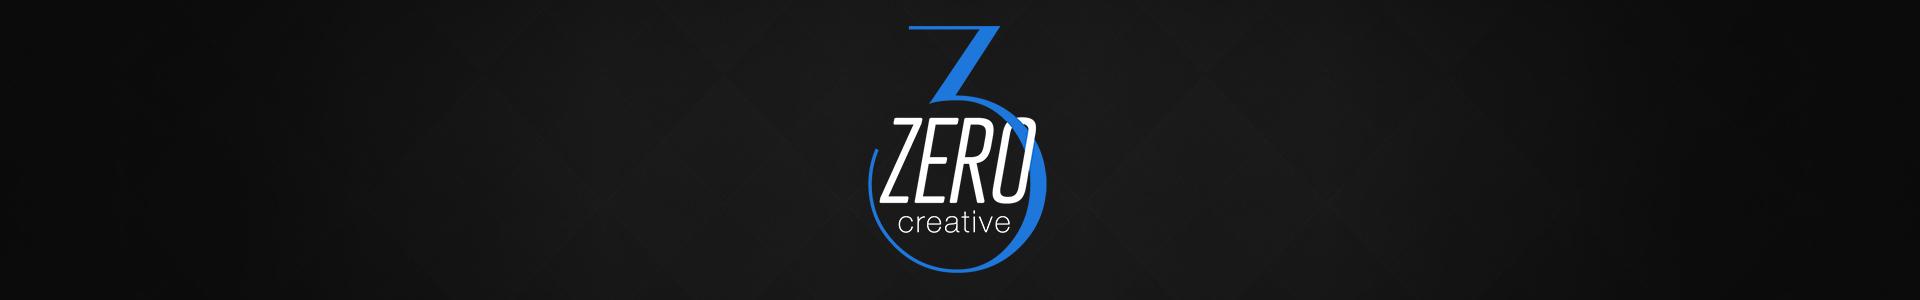 3Zero Creative | Design | Web | Marketing | Social